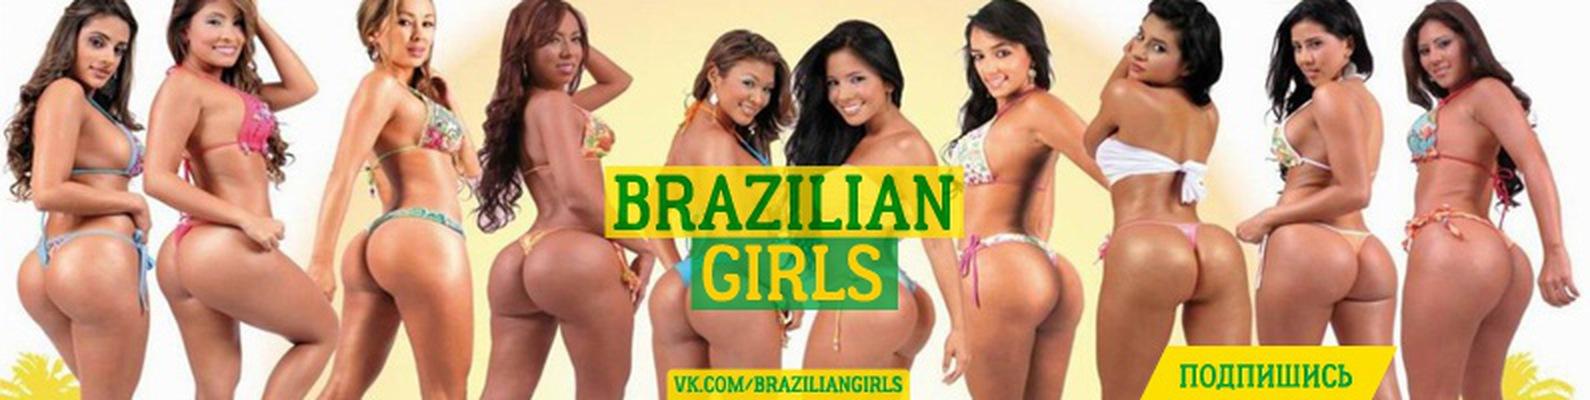 brazilskie-porno-zvezdi-foto-vk-smotret-porno-video-mineta